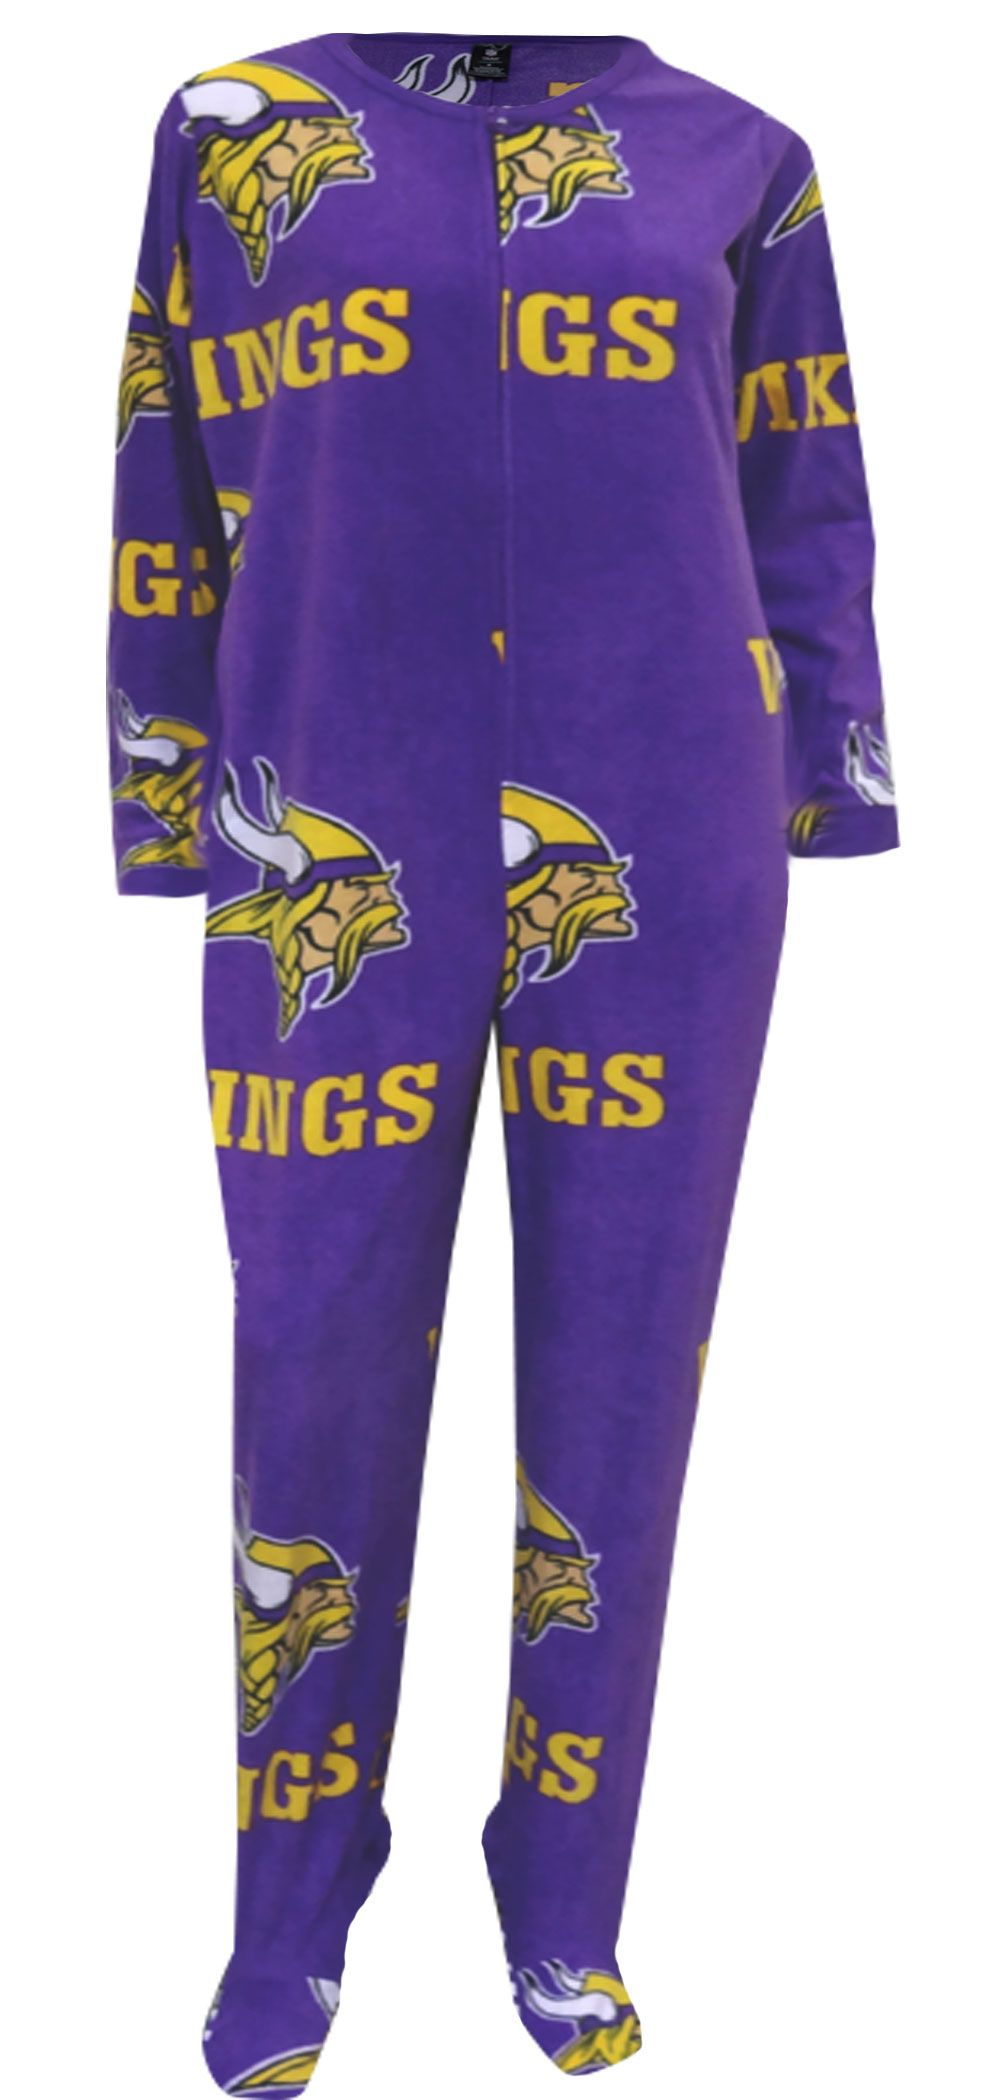 WebUndies.com Minnesota Vikings Ladies Onesie Footie Pajama ... 9a4578c56